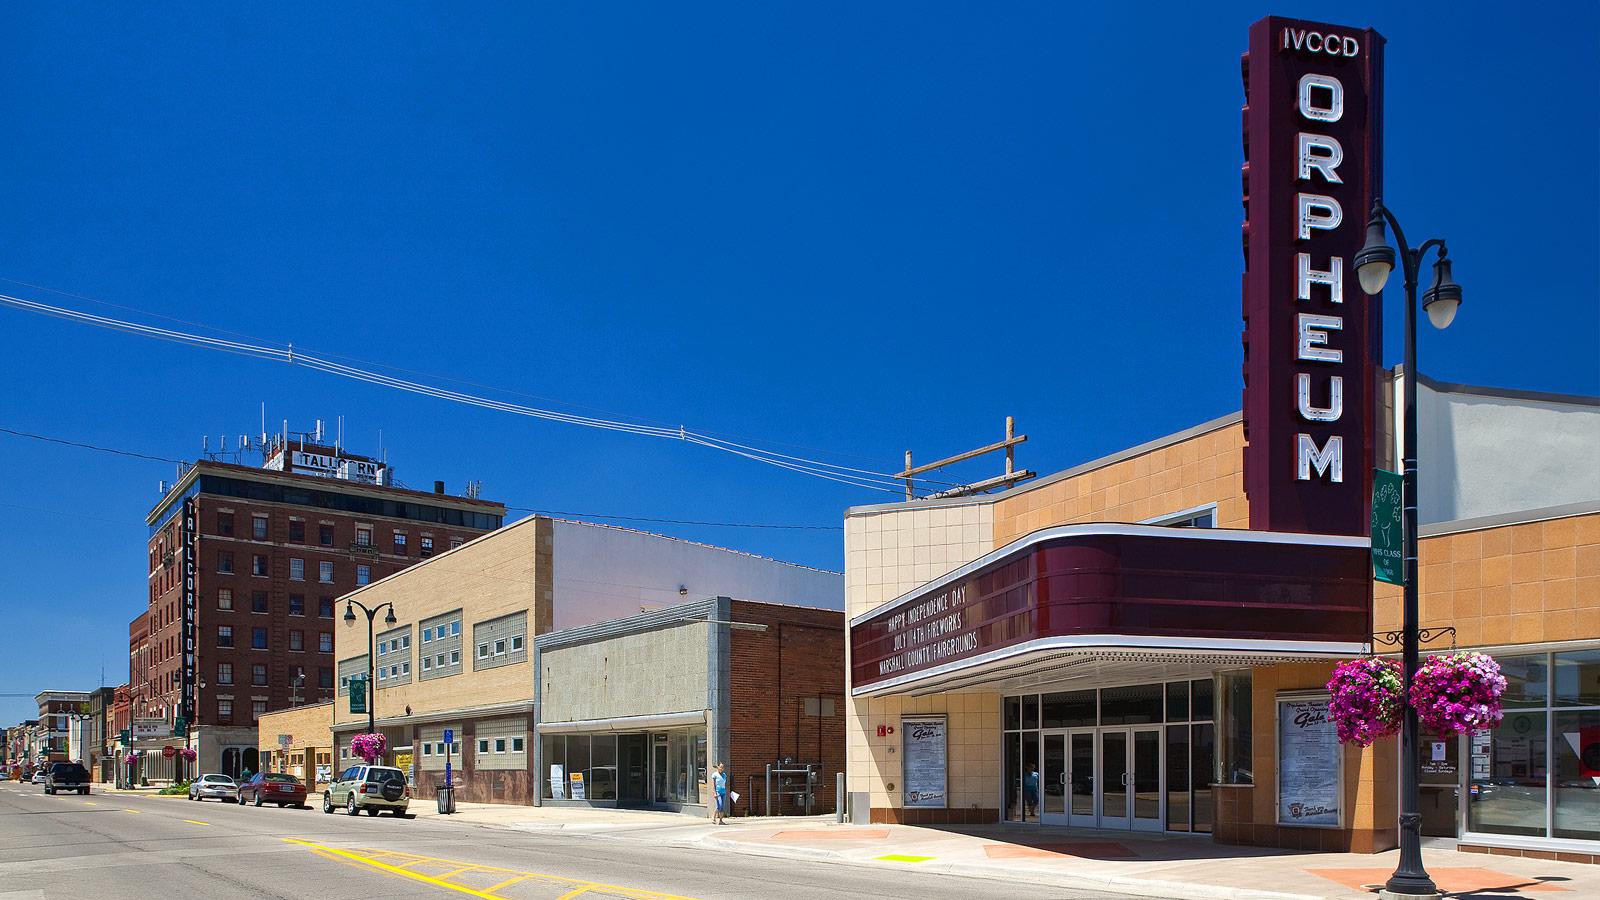 IVCCD Orpheum Theater Center